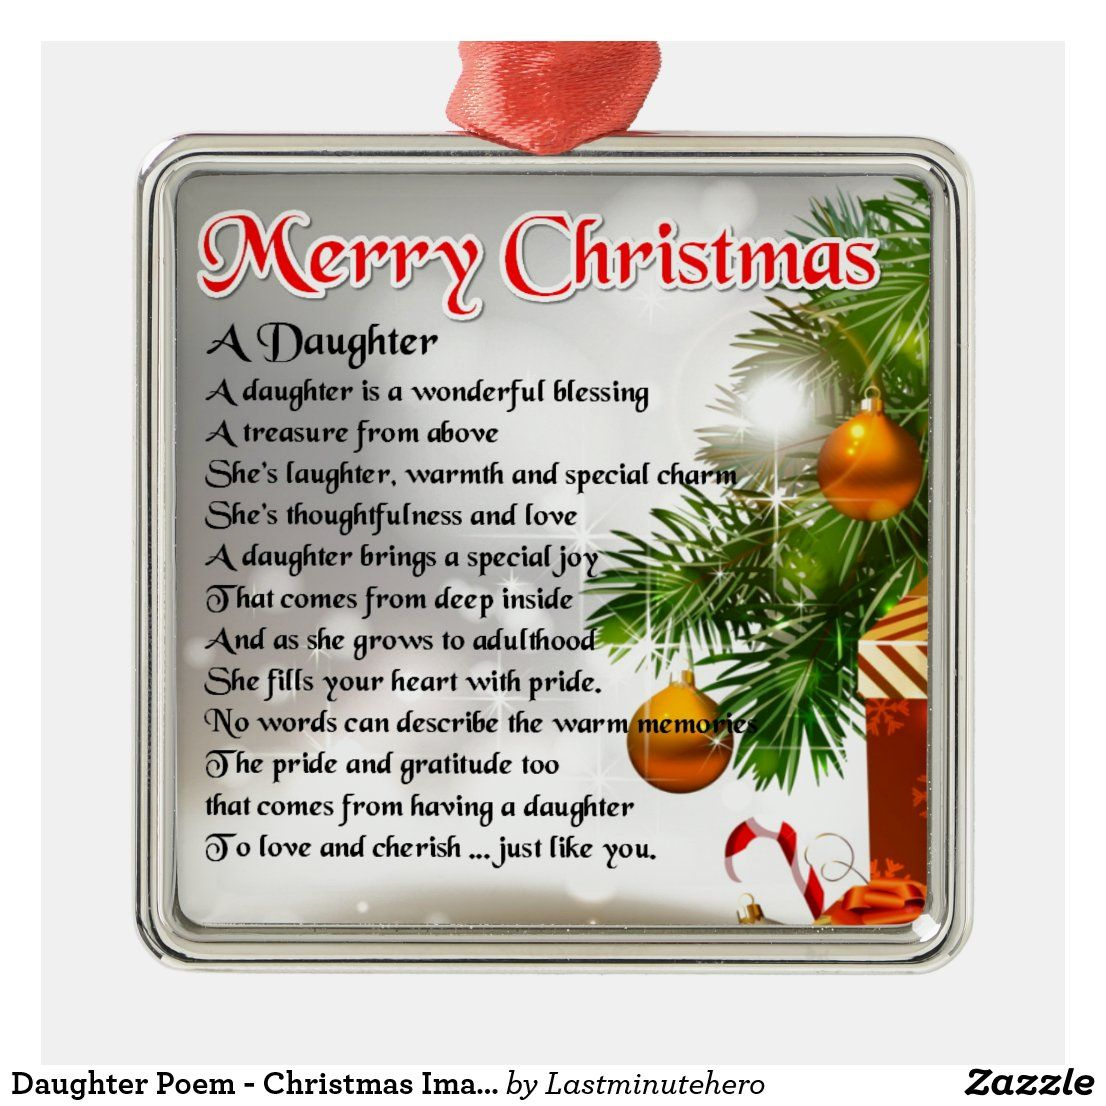 Daughter Poem Christmas Image Metal Ornament Zazzle Com Christmas Poems Daughter Poems Christmas Design